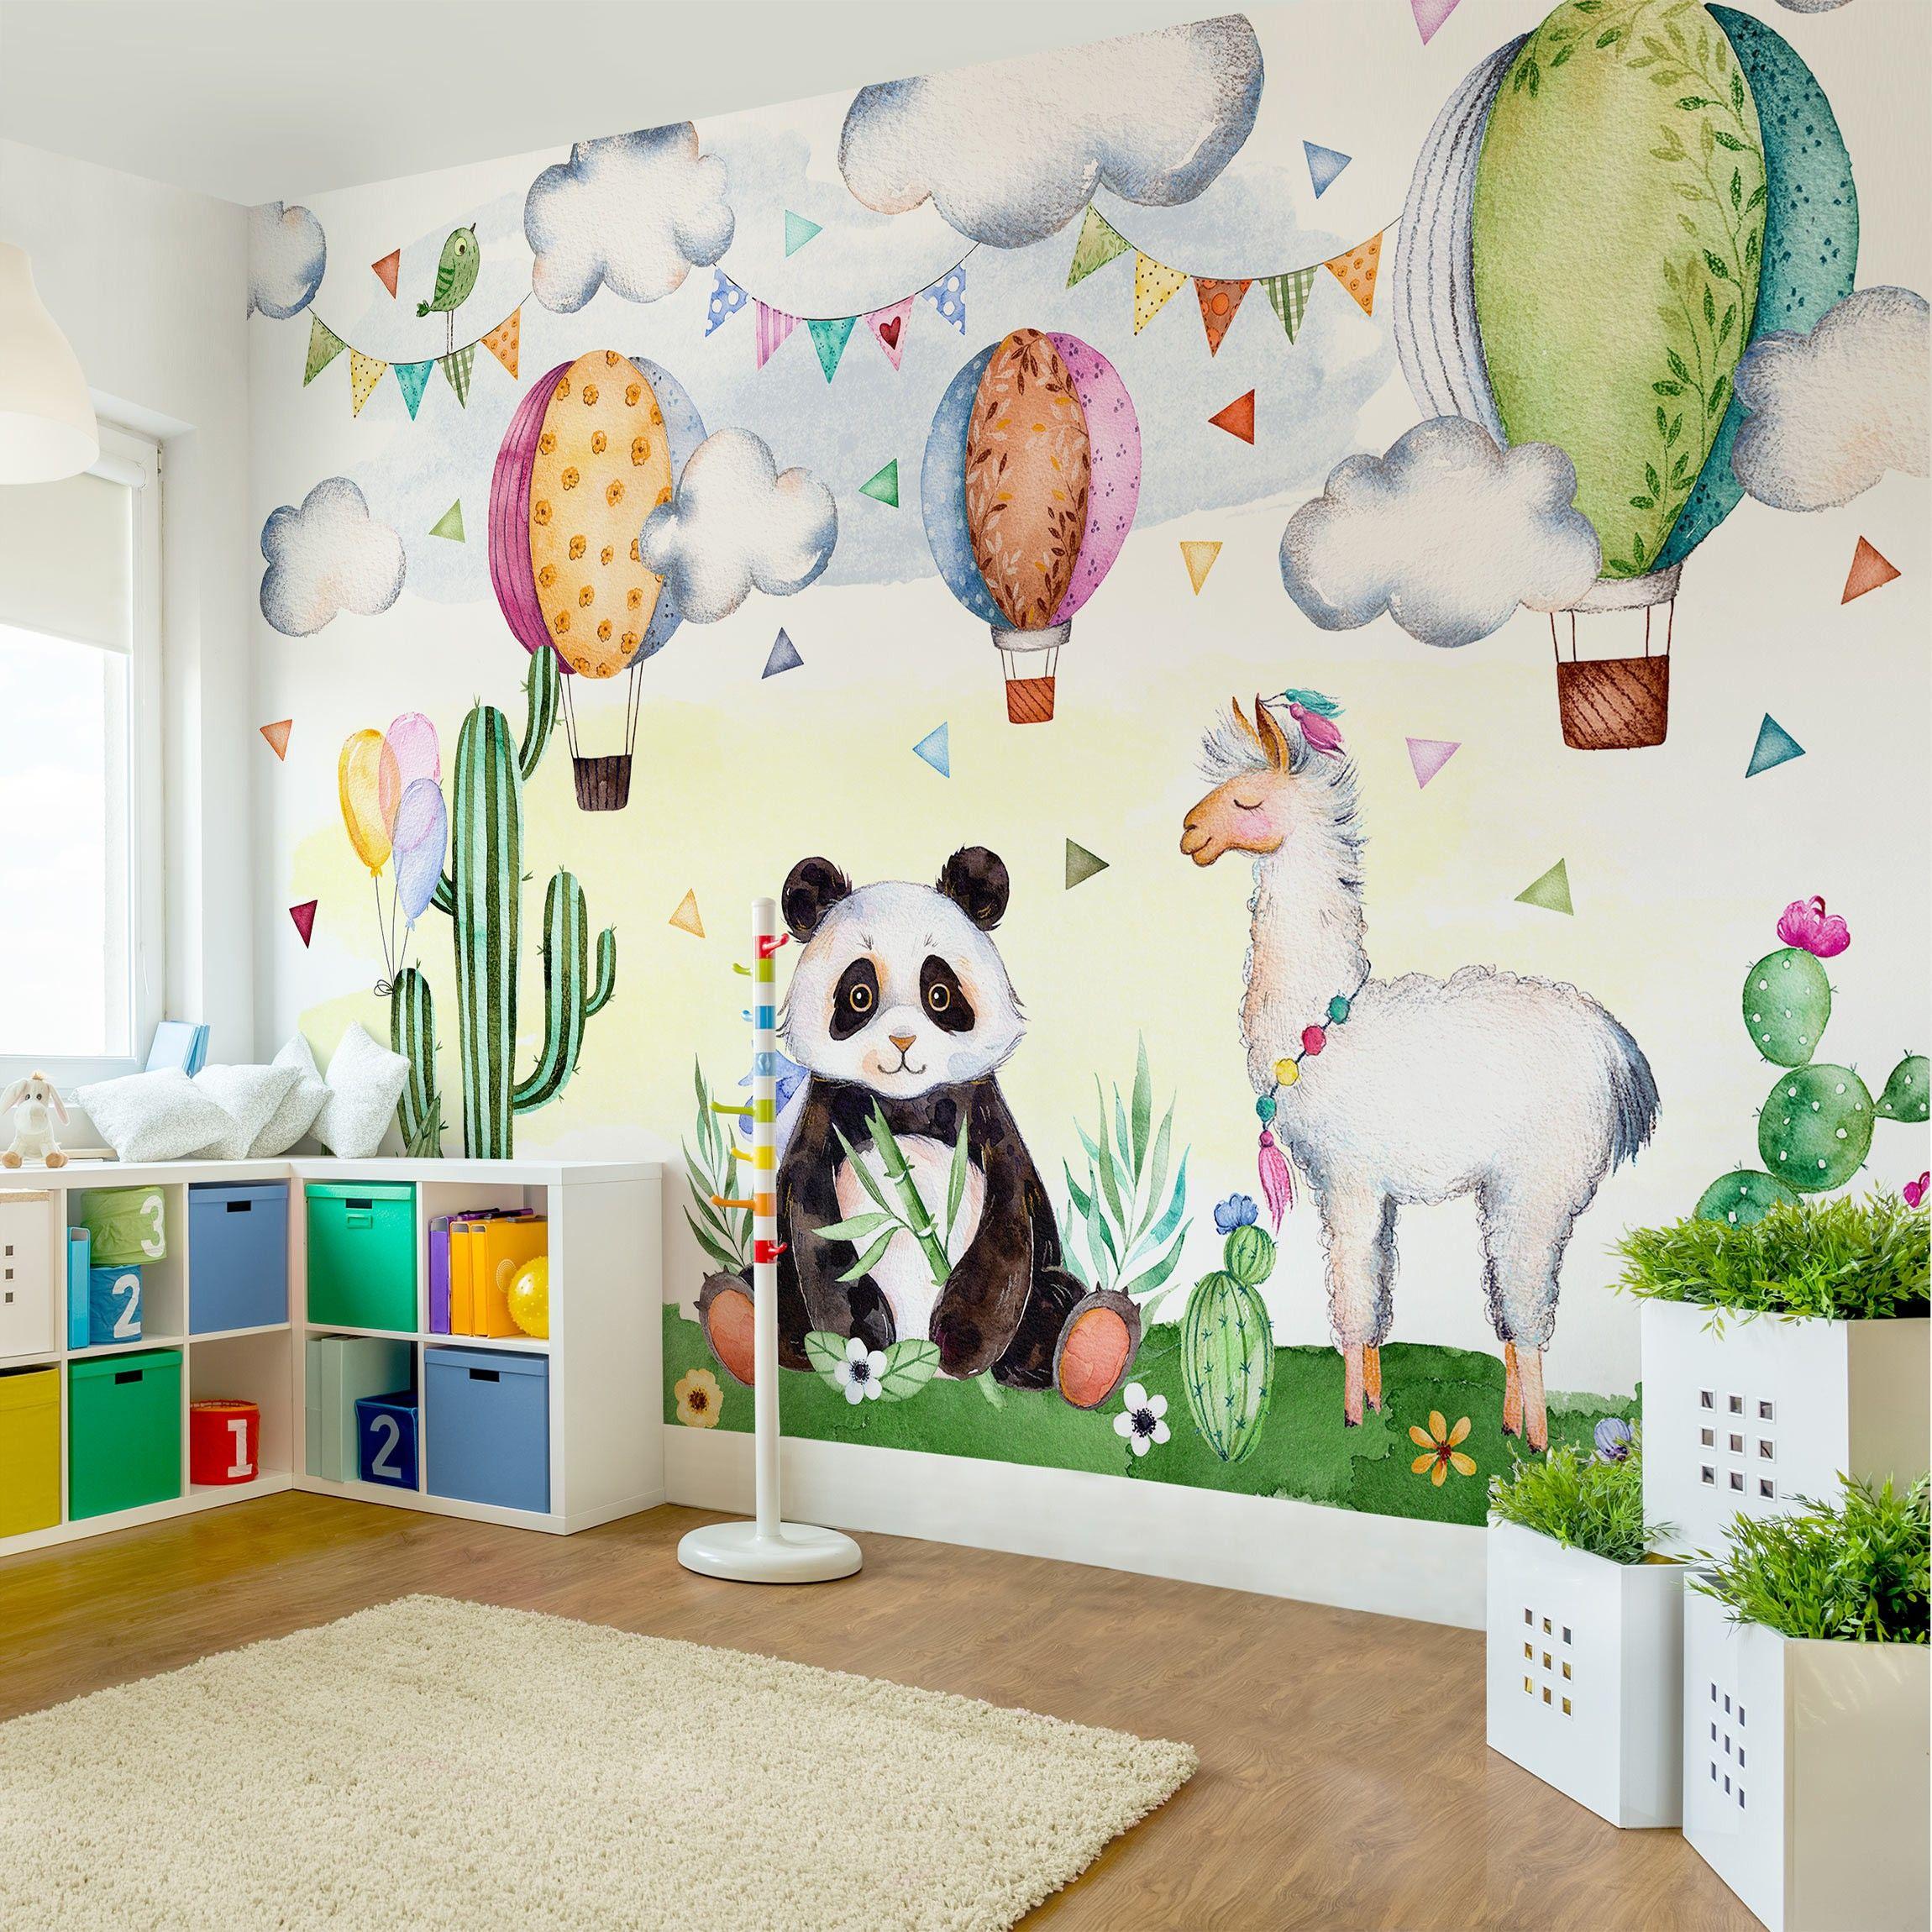 Fototapete Panda Und Lama Aquarell In 2020 Kinder Tapete